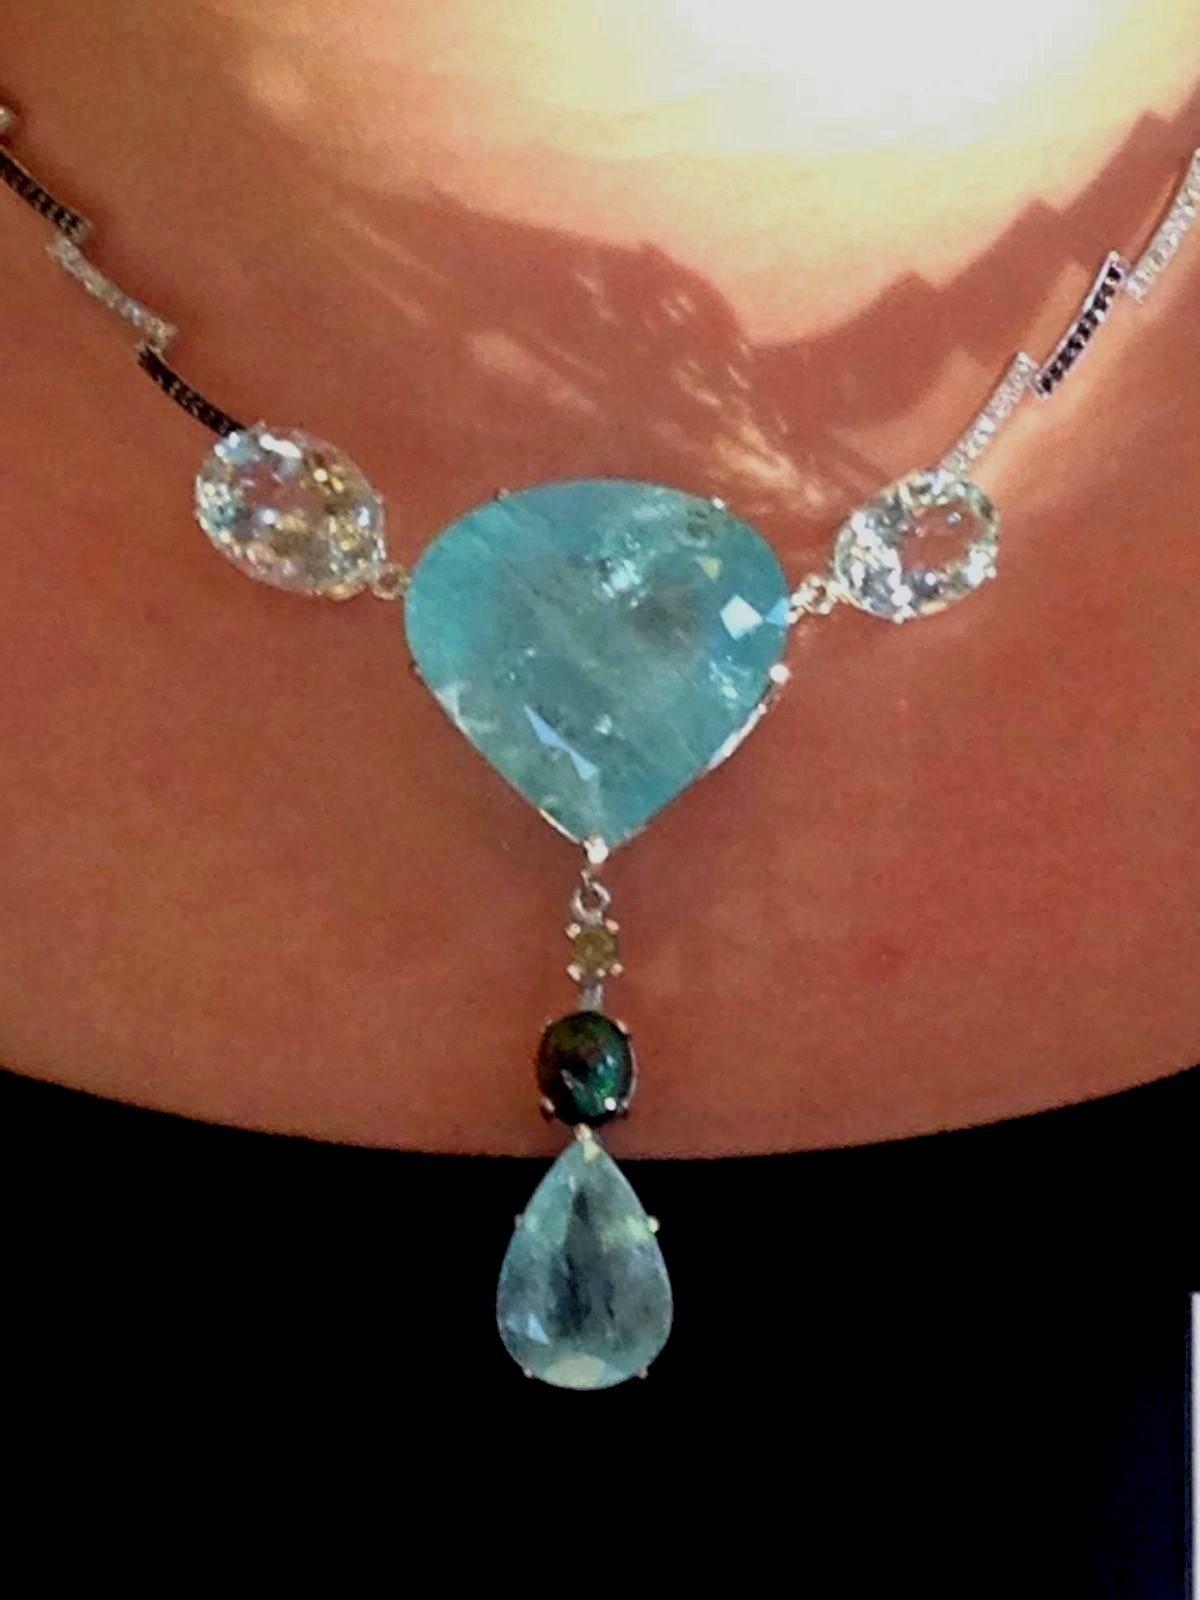 Huge 113.29 ct aquamarine, opal, white & black diamond 14k gold necklace choker